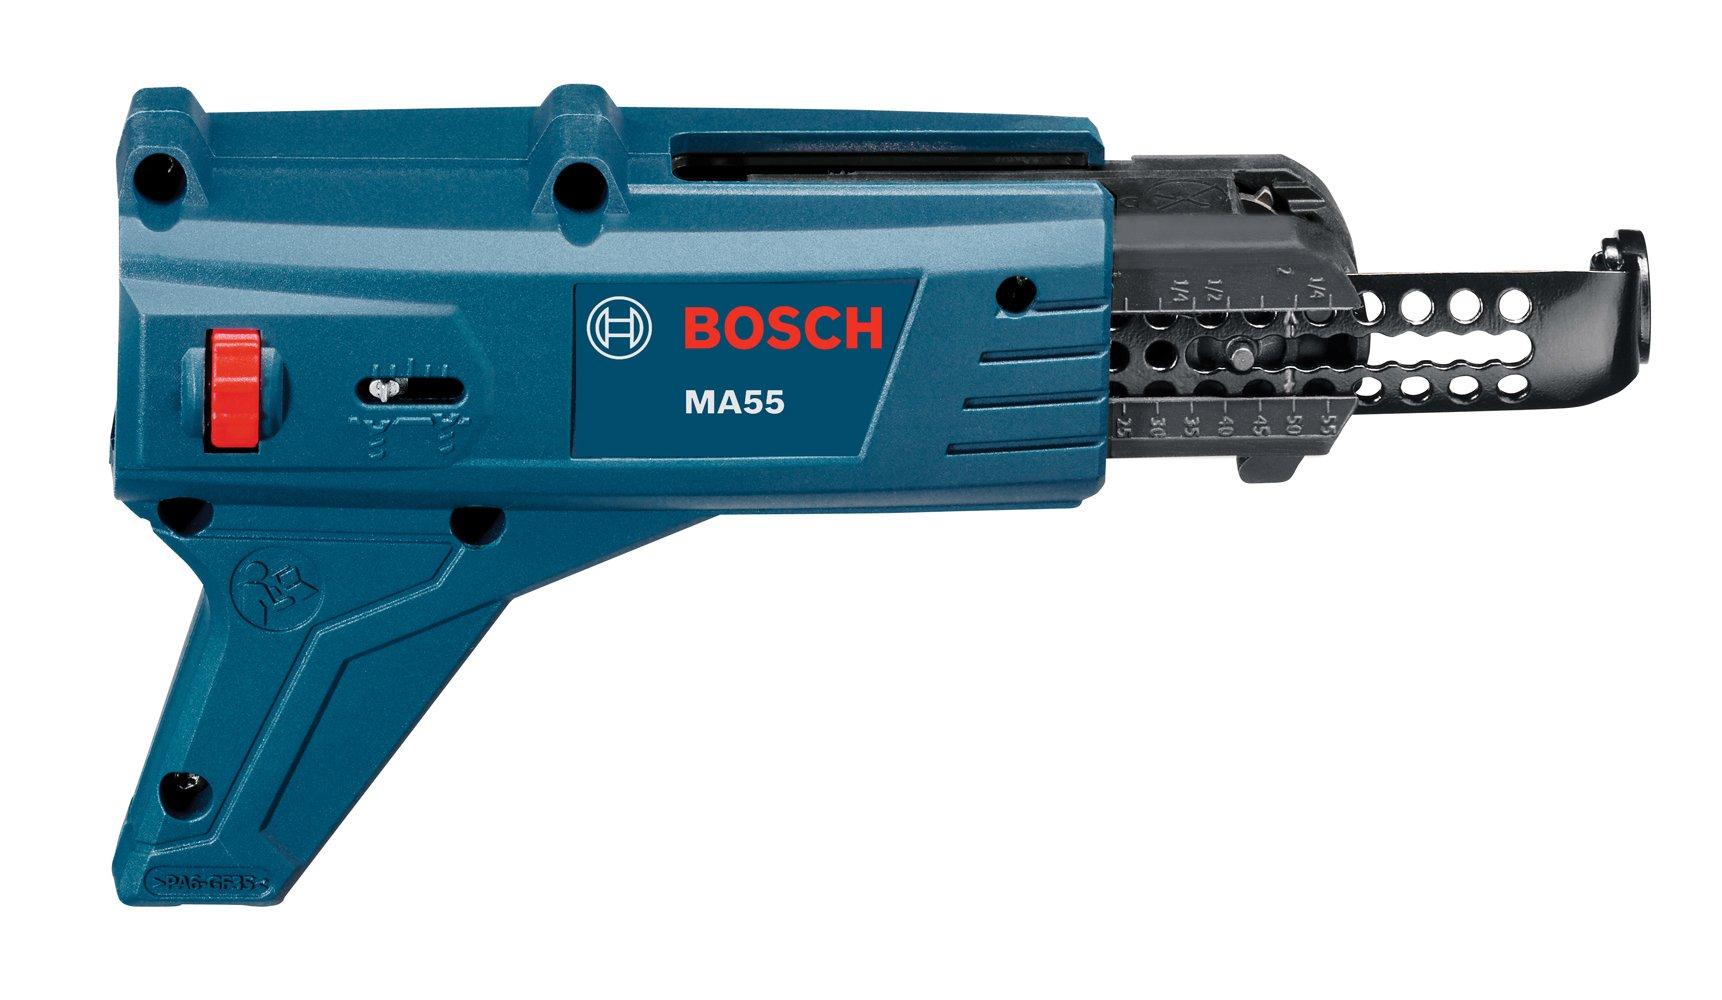 Bosch MA55 Auto Feed Attachment for Screw Guns by Bosch